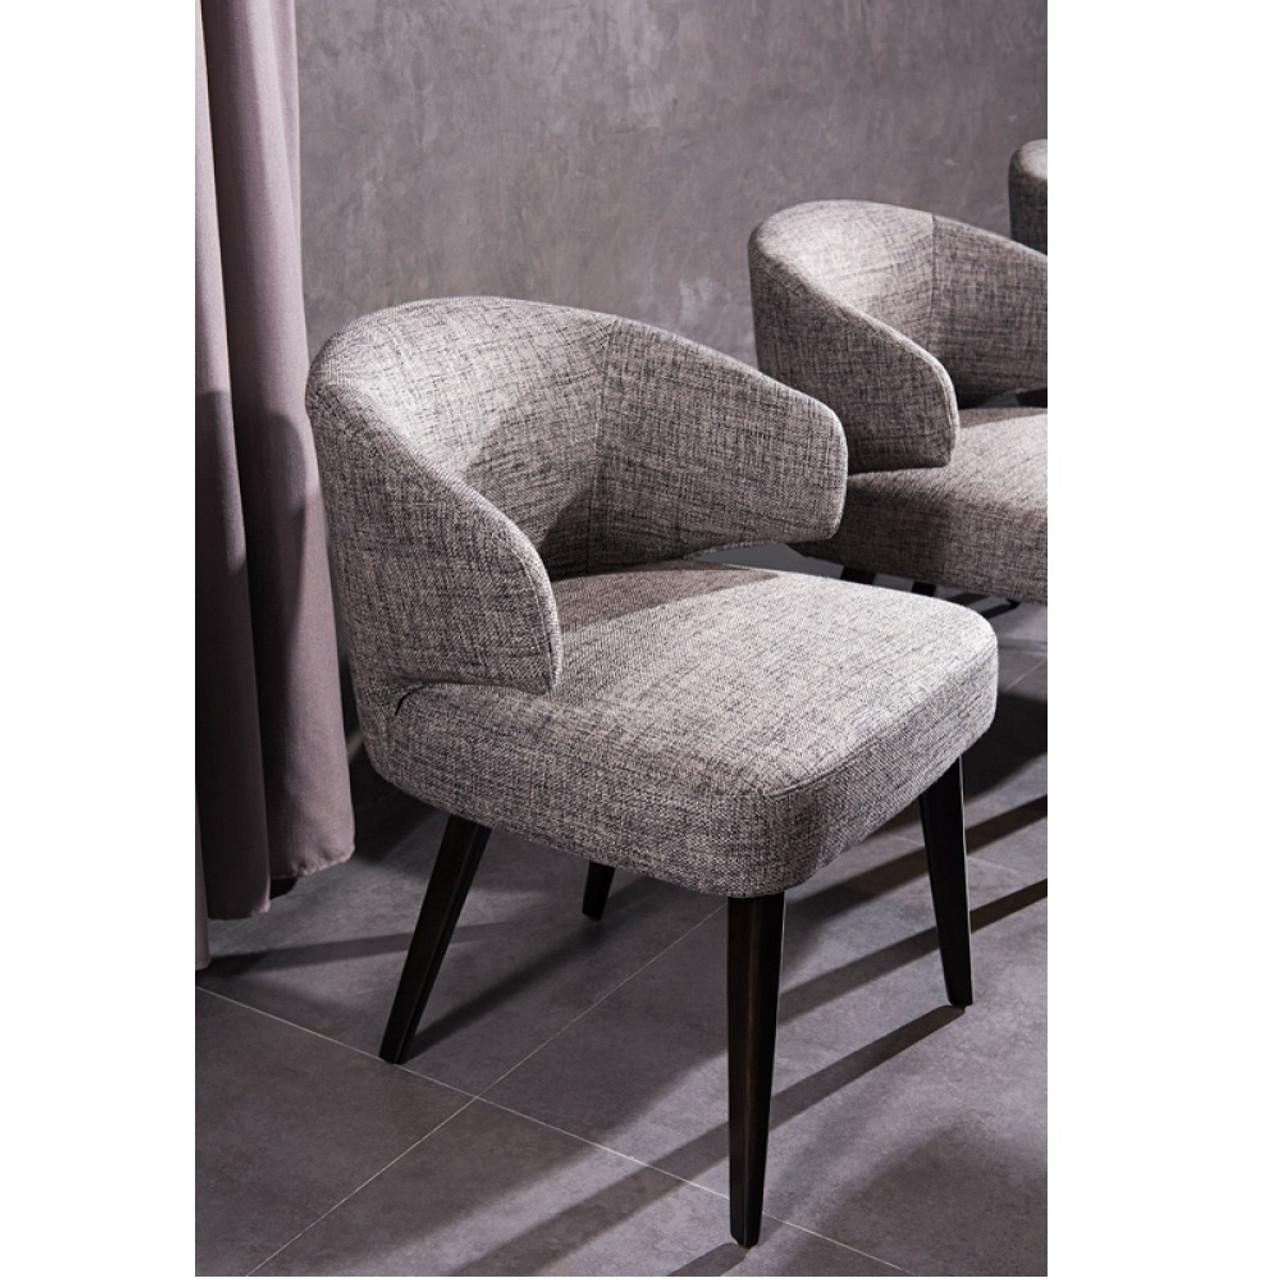 Super Modrest Carlton Modern Grey Fabric Dining Chair Bralicious Painted Fabric Chair Ideas Braliciousco